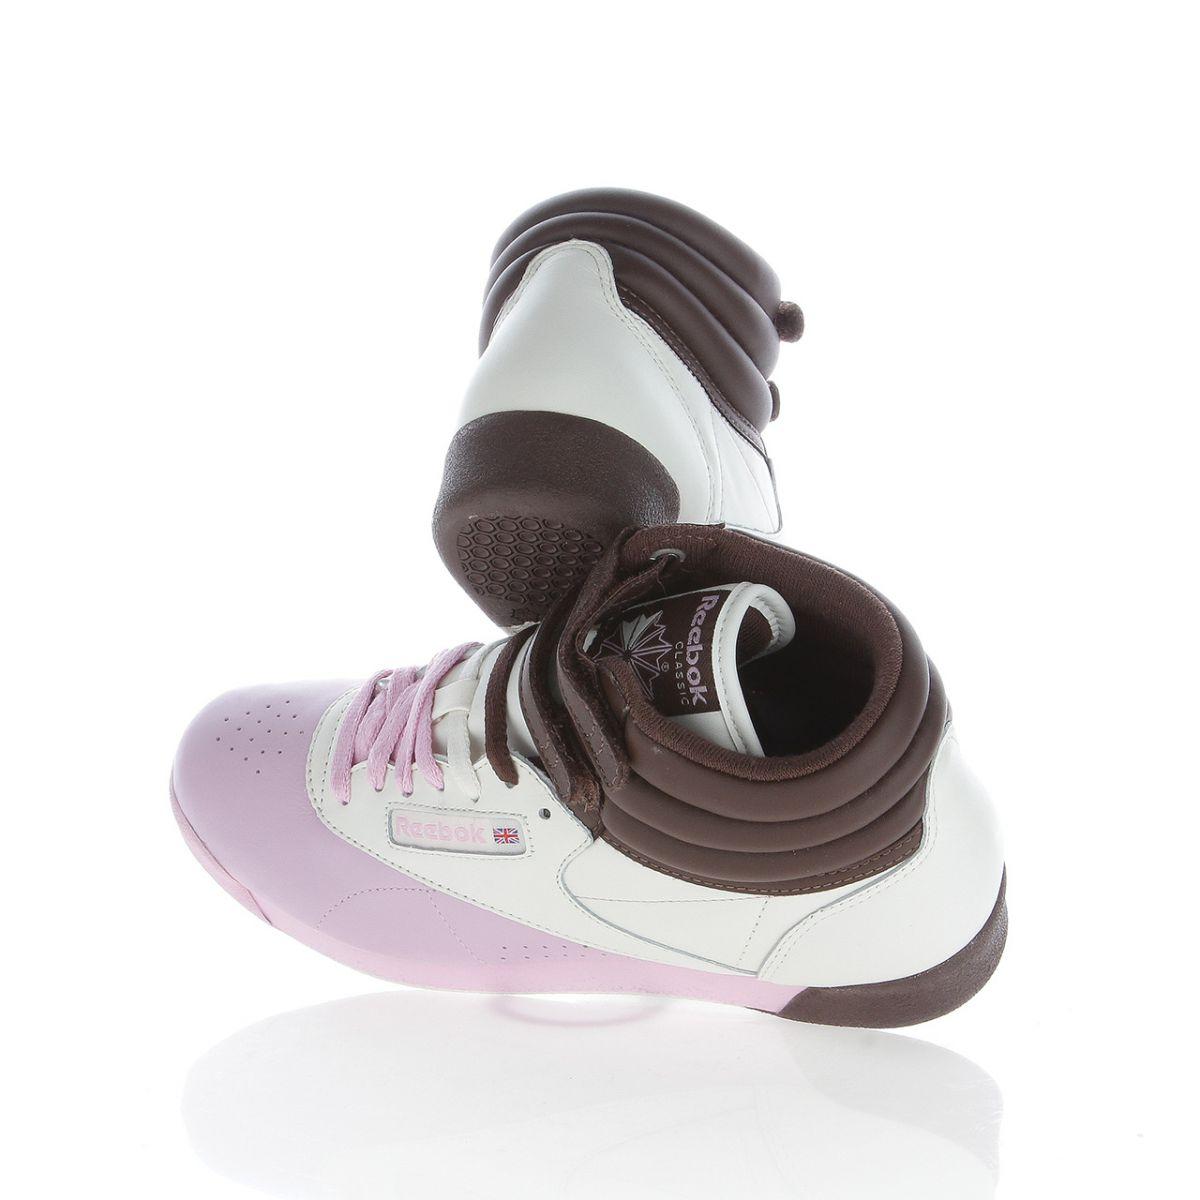 adidas puma reebok asics nike okazja wyprzedaż 6f8765dda2a4